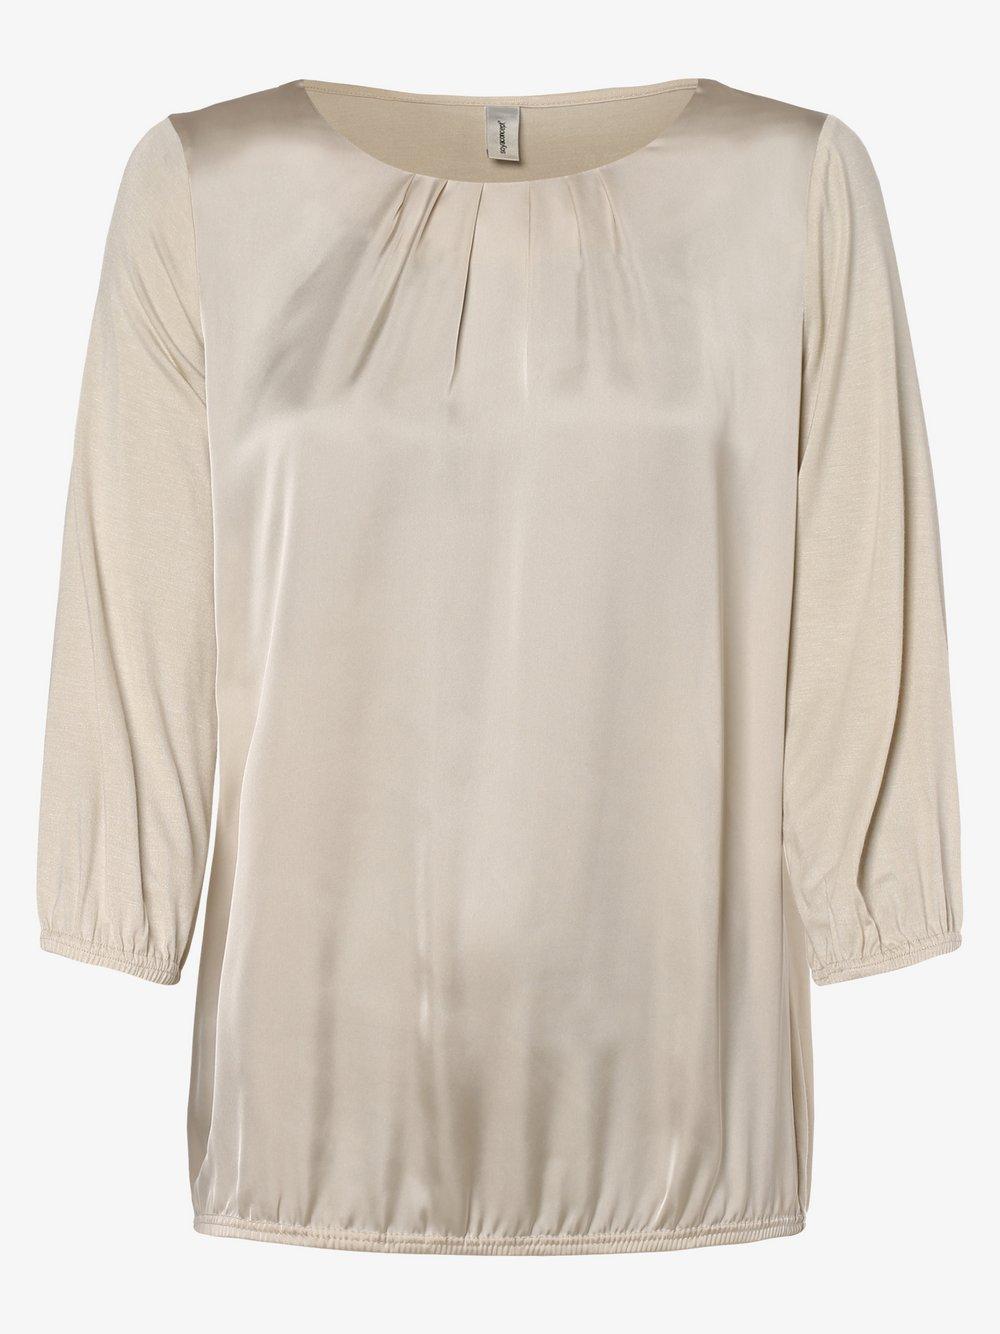 soyaconcept® – Damska koszulka z długim rękawem – Thilde, beżowy Van Graaf 460882-0001-09970